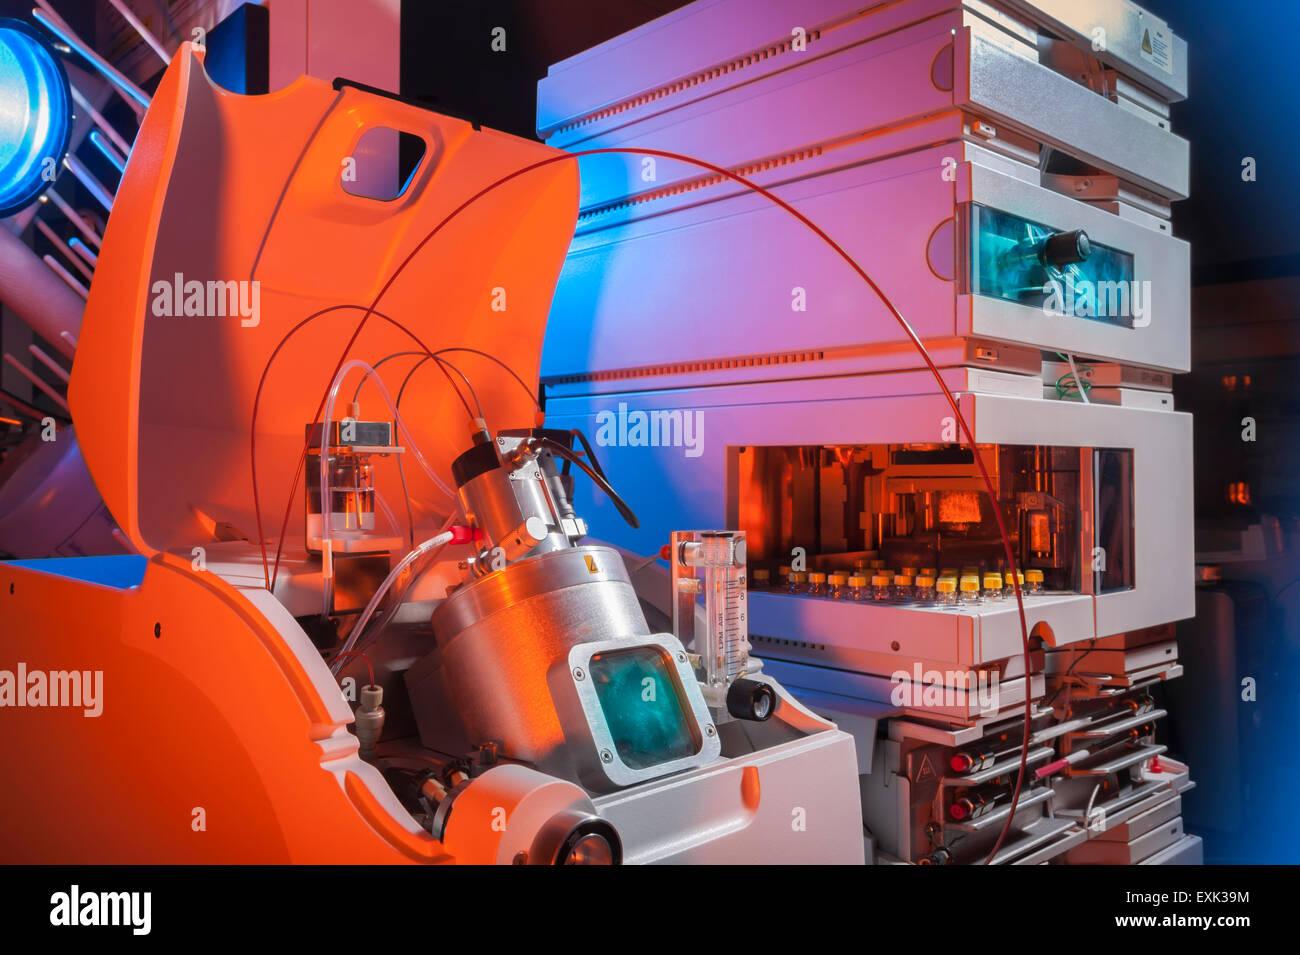 Biotechnology laboratory hardware equipment used to analyse various medical samples - Stock Image